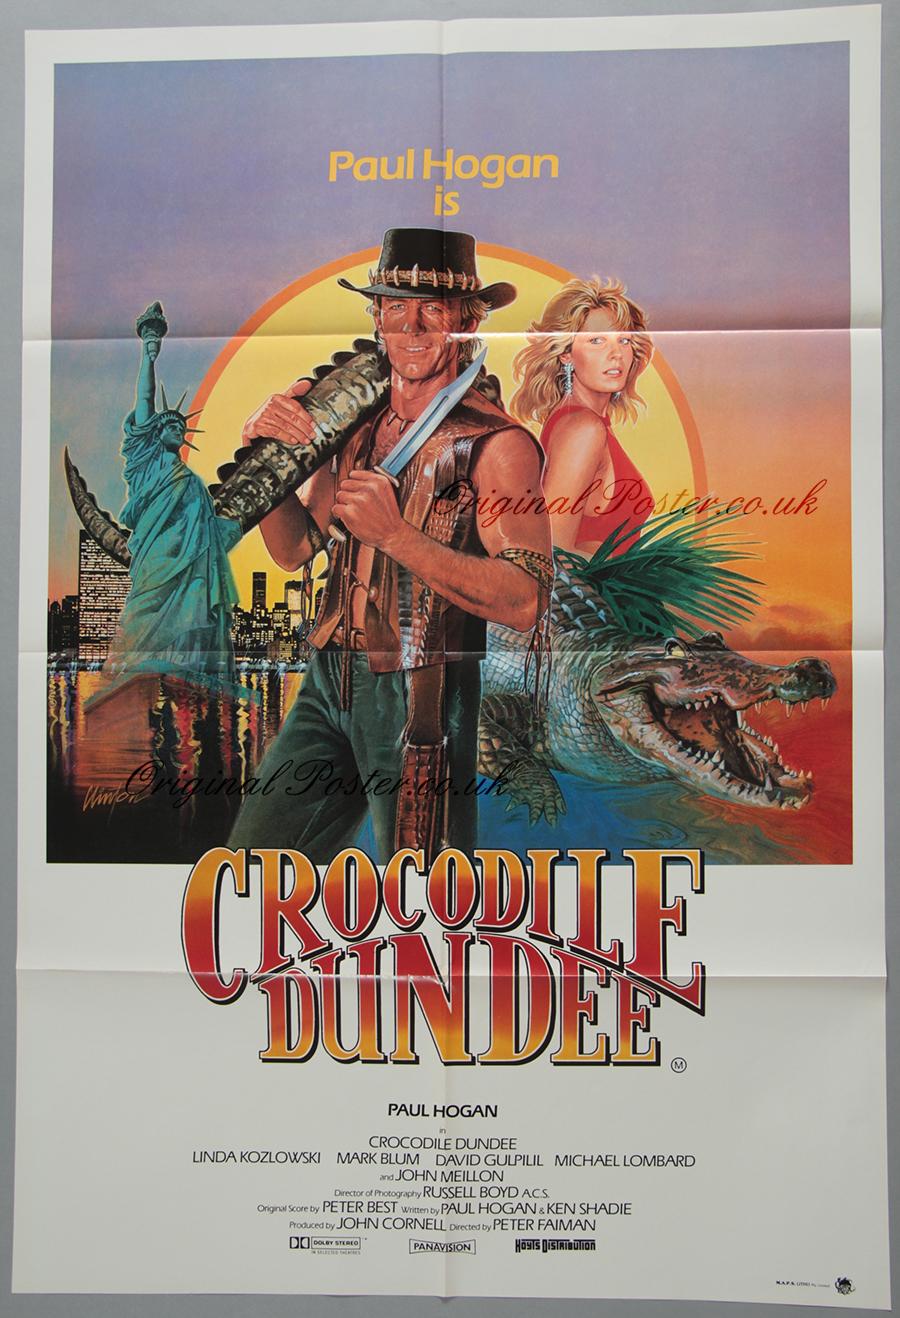 Crocodile Dundee, Original Vintage Film Poster | Original ...